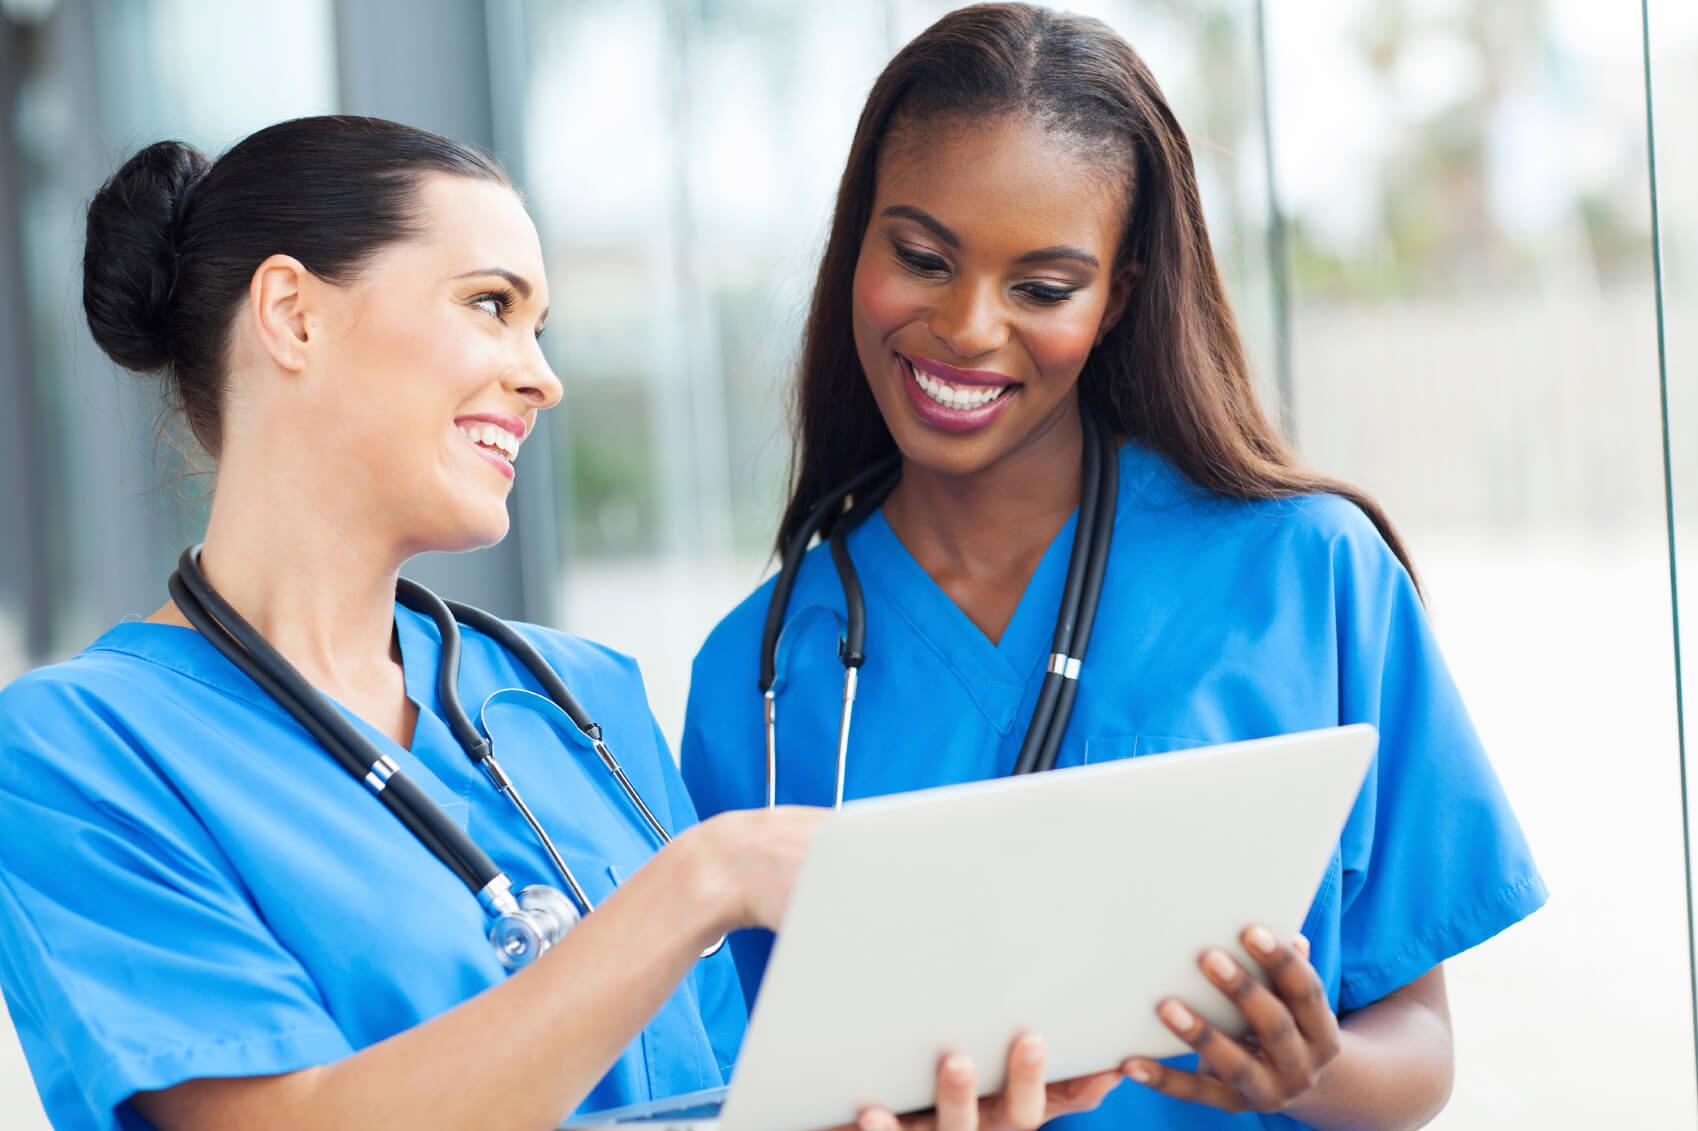 Best New Nursing Job Opportunities - Wednesday 11/18